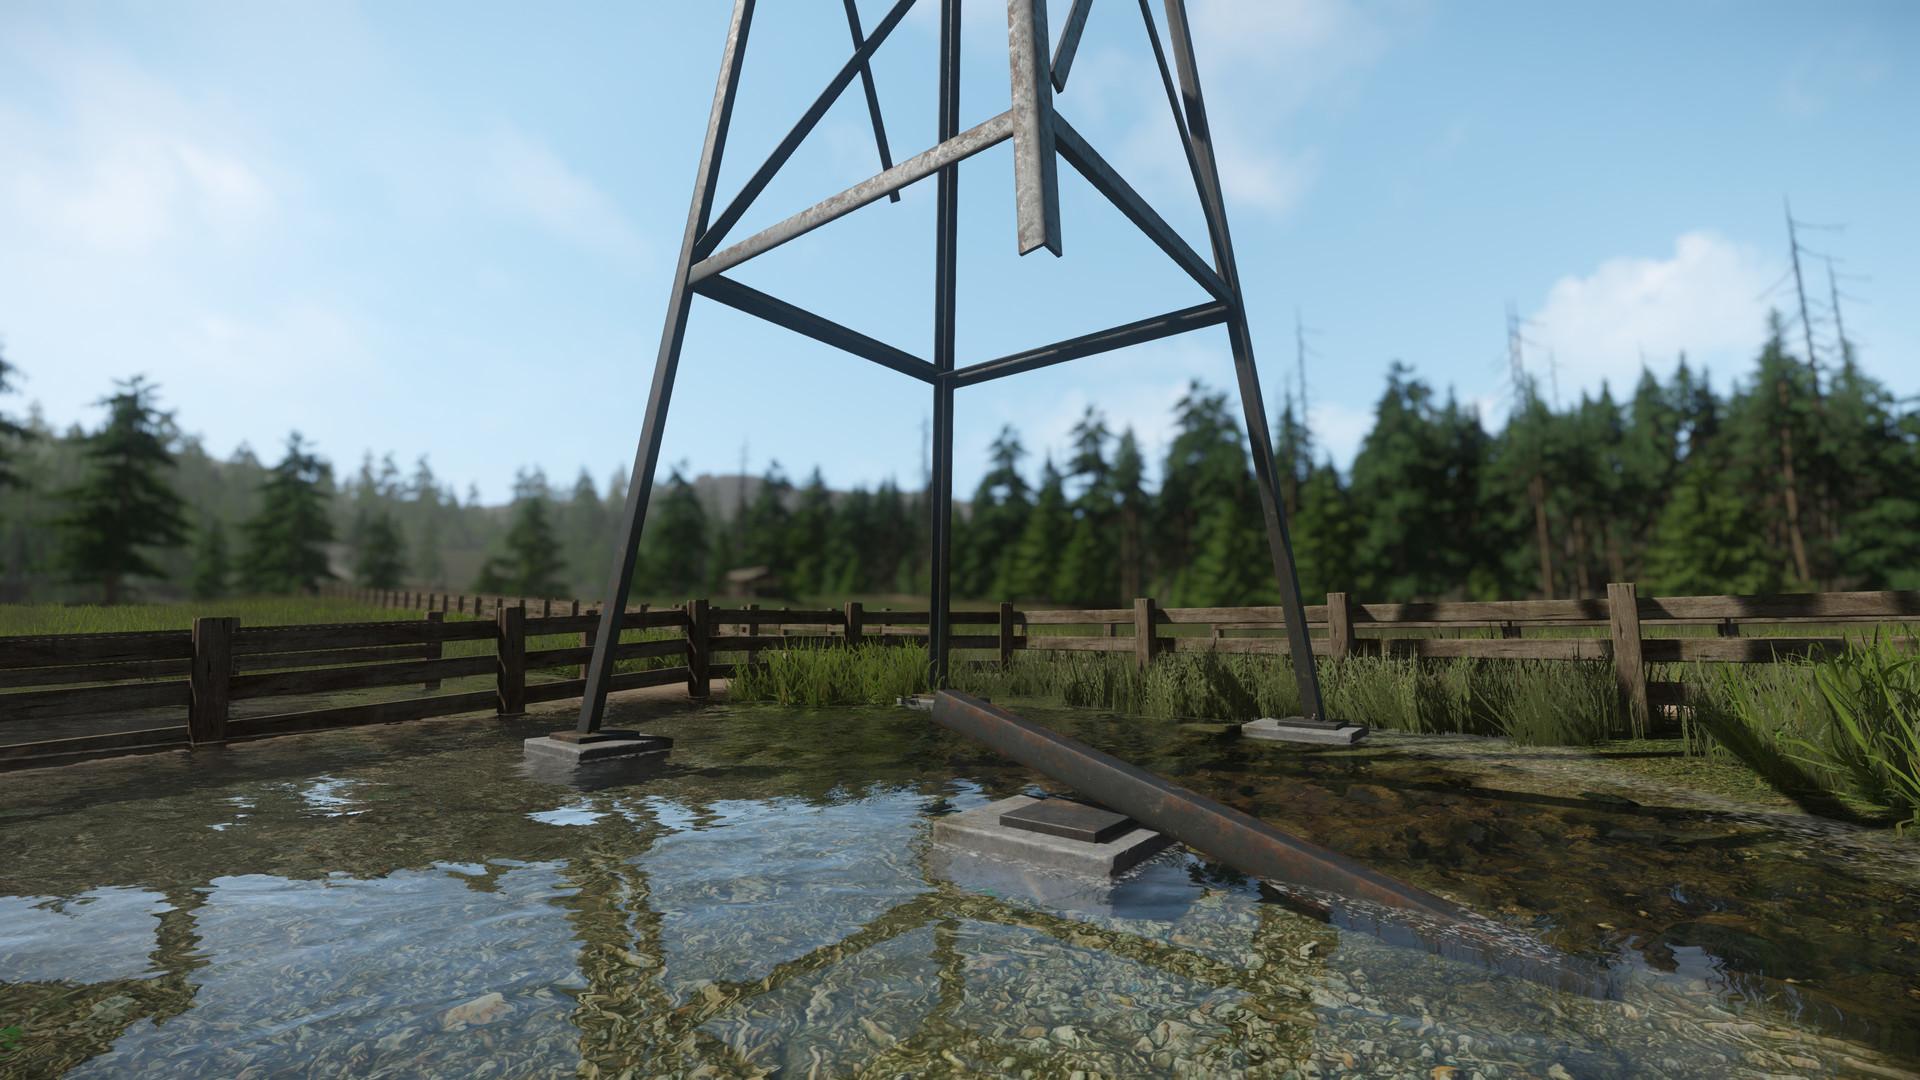 Carl kent screenshot0007